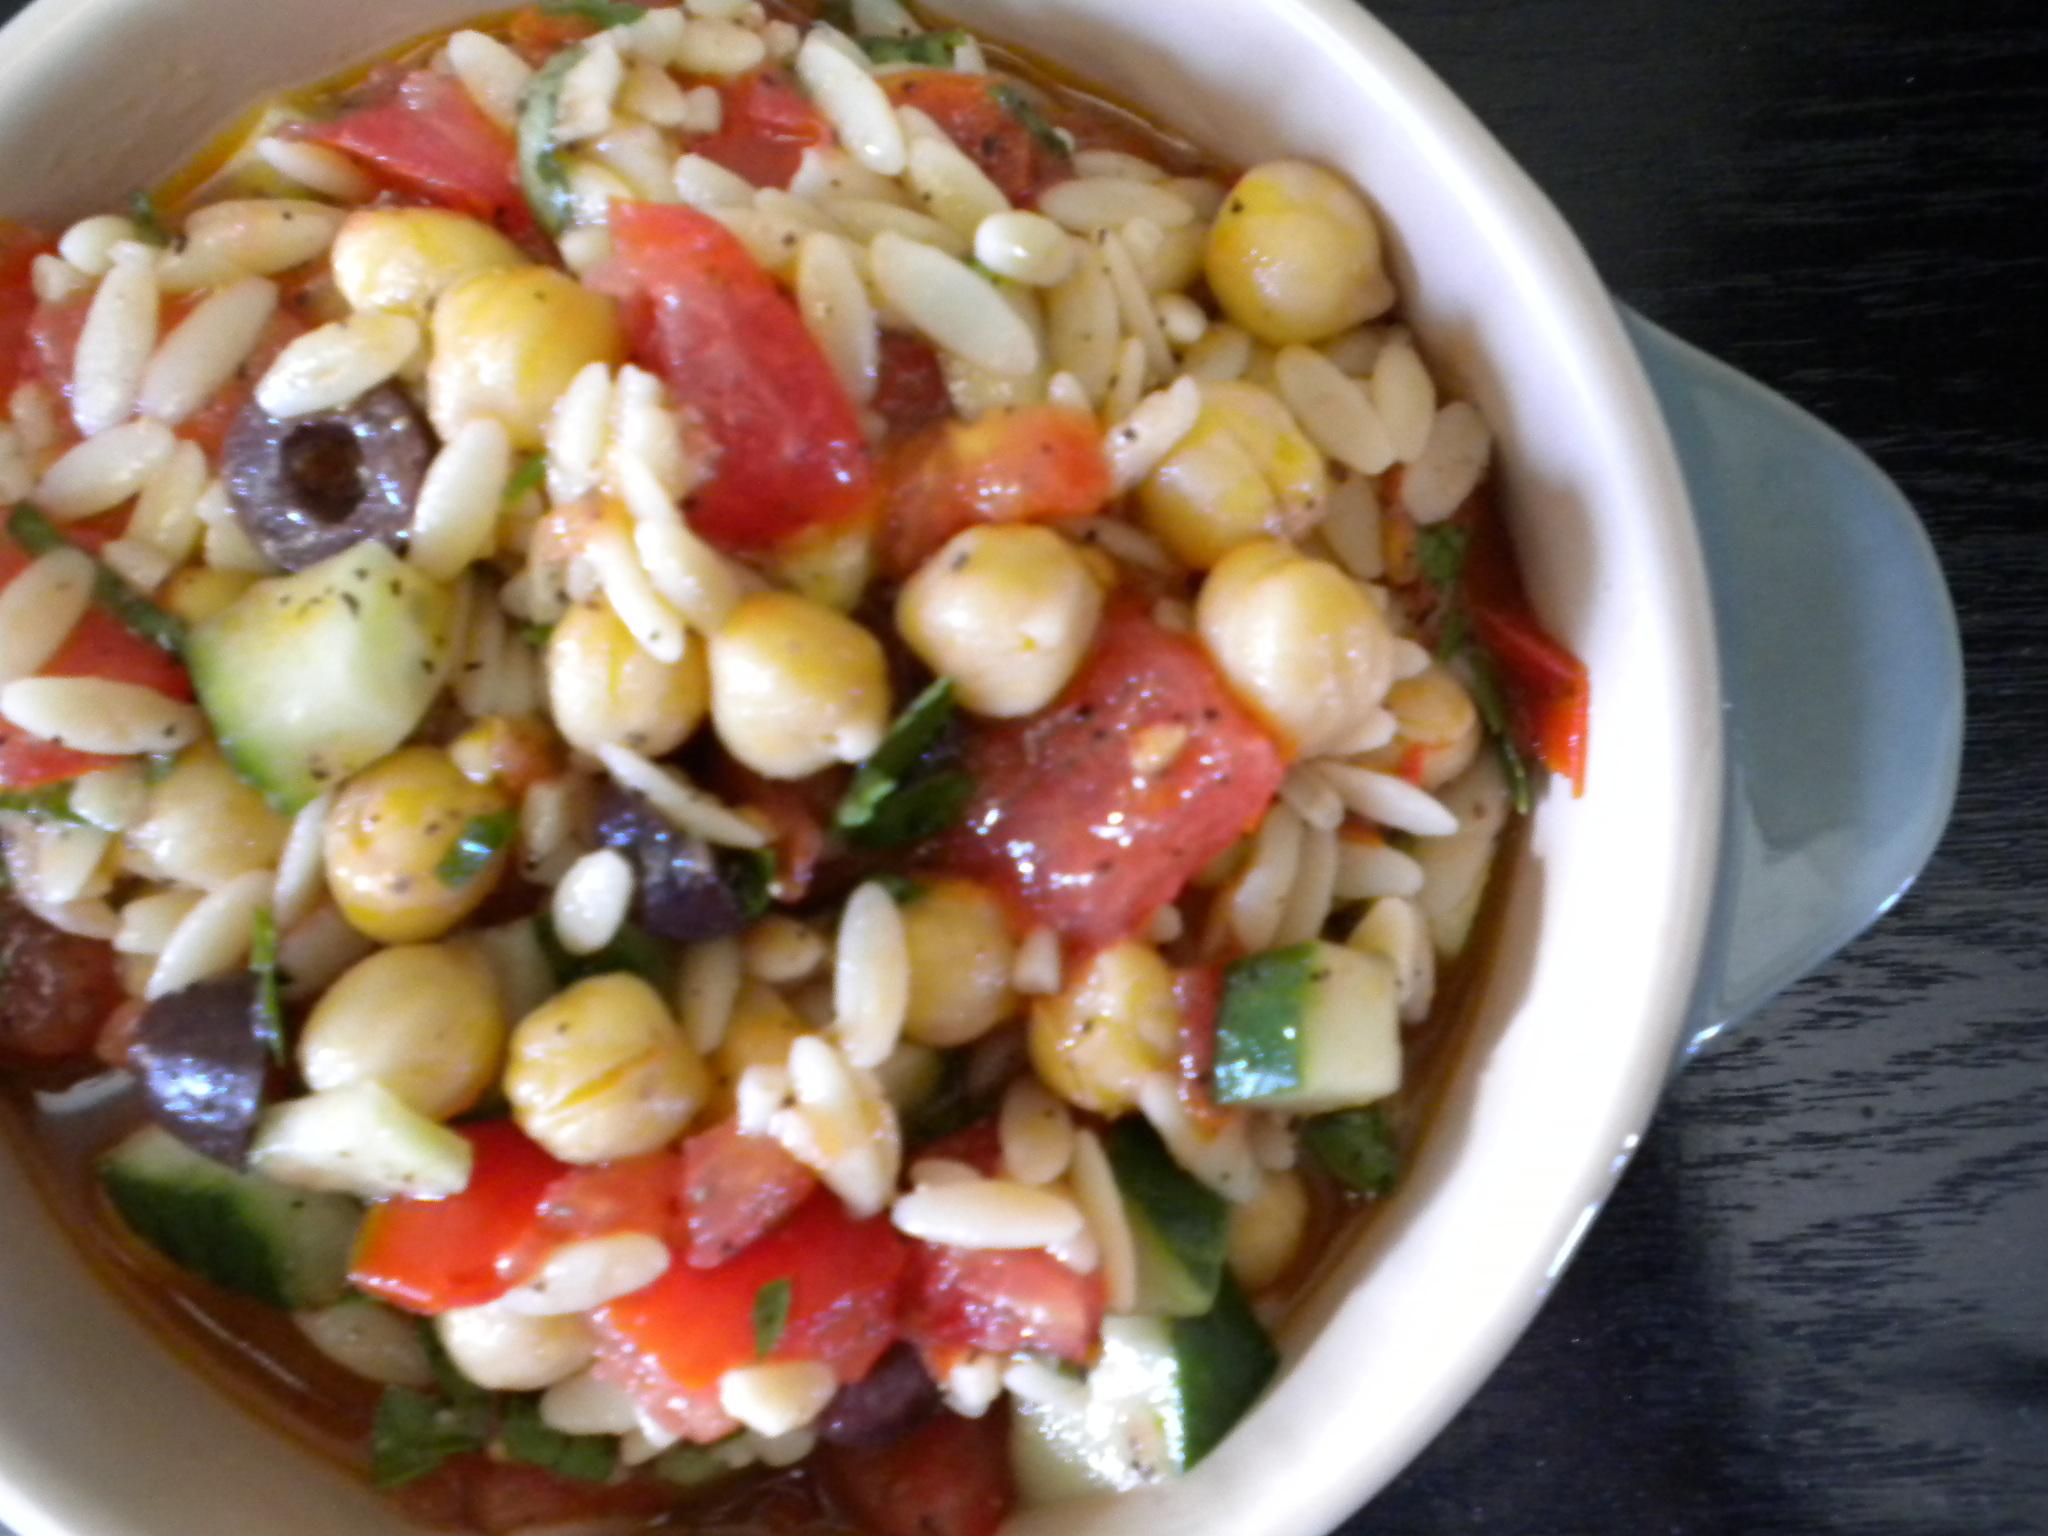 Tomato, Orzo and Chickpea Salad